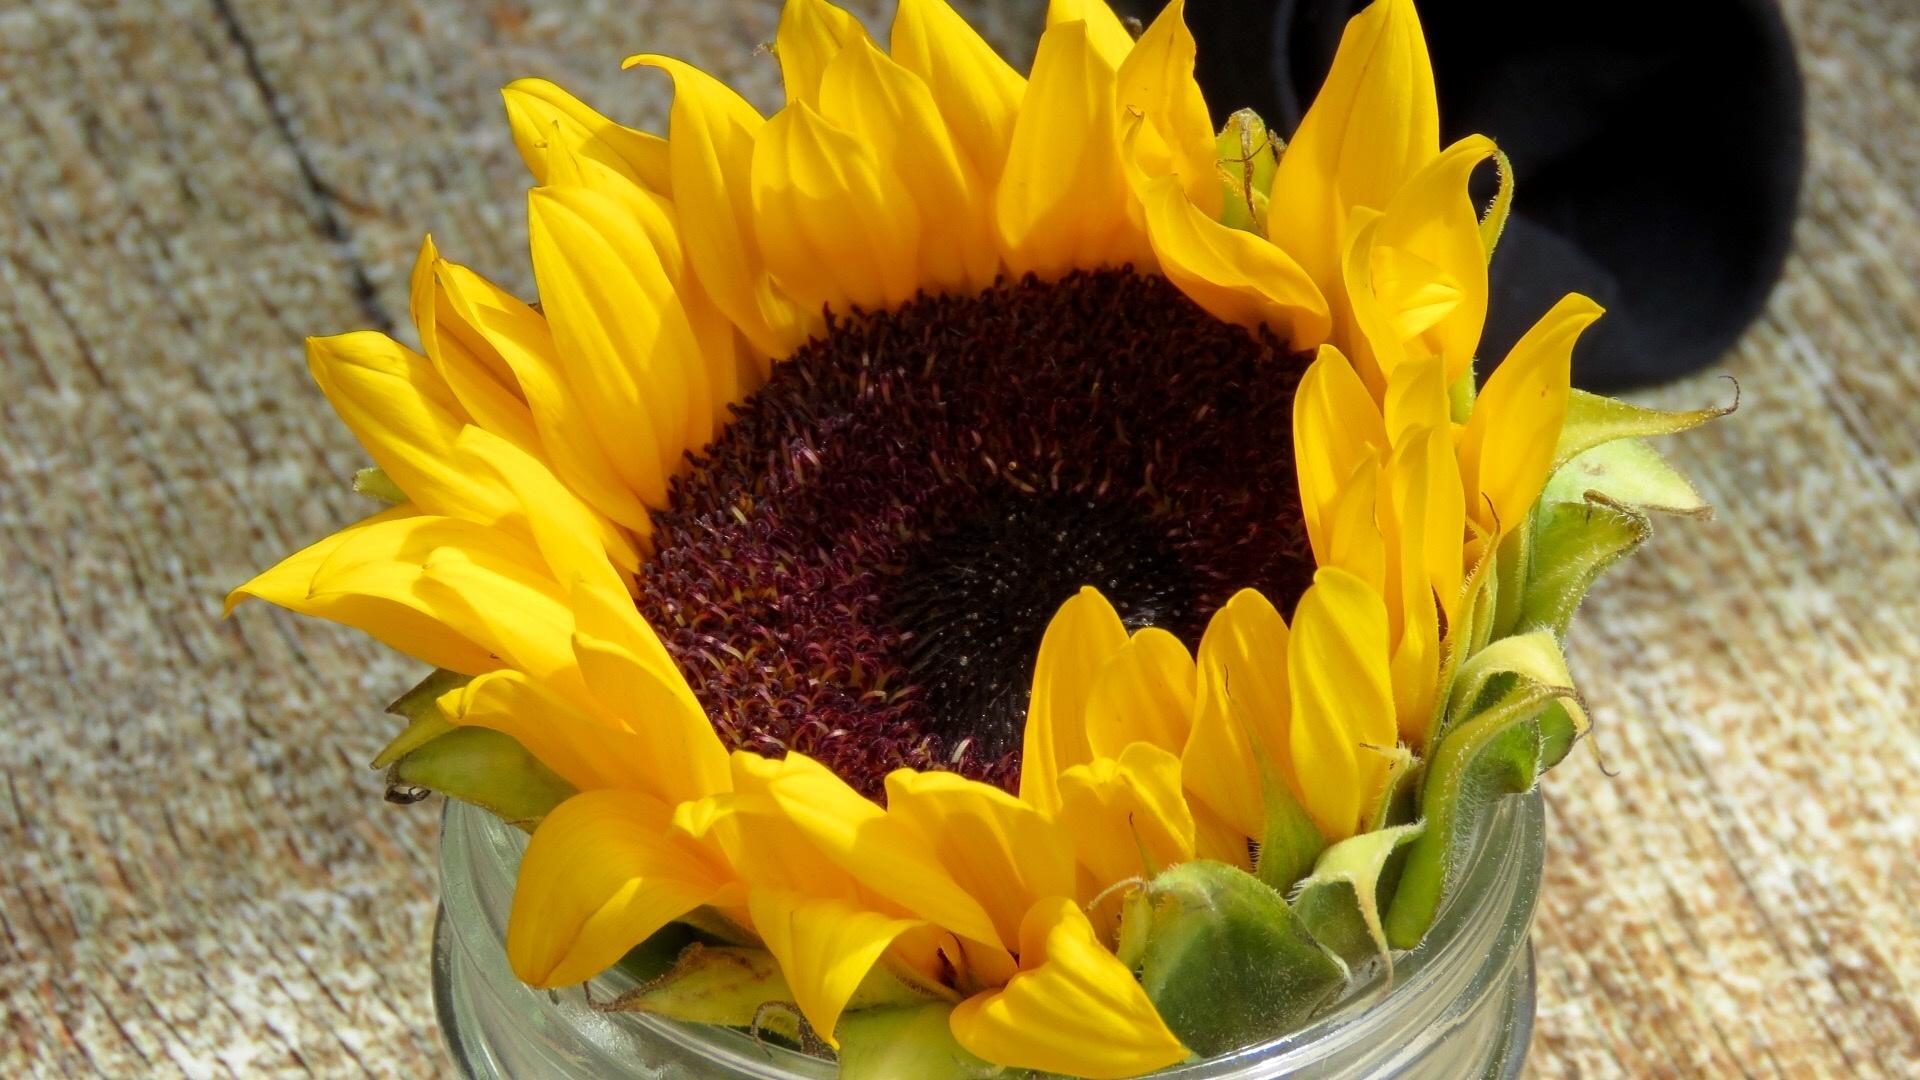 Sunflower by Kimberly